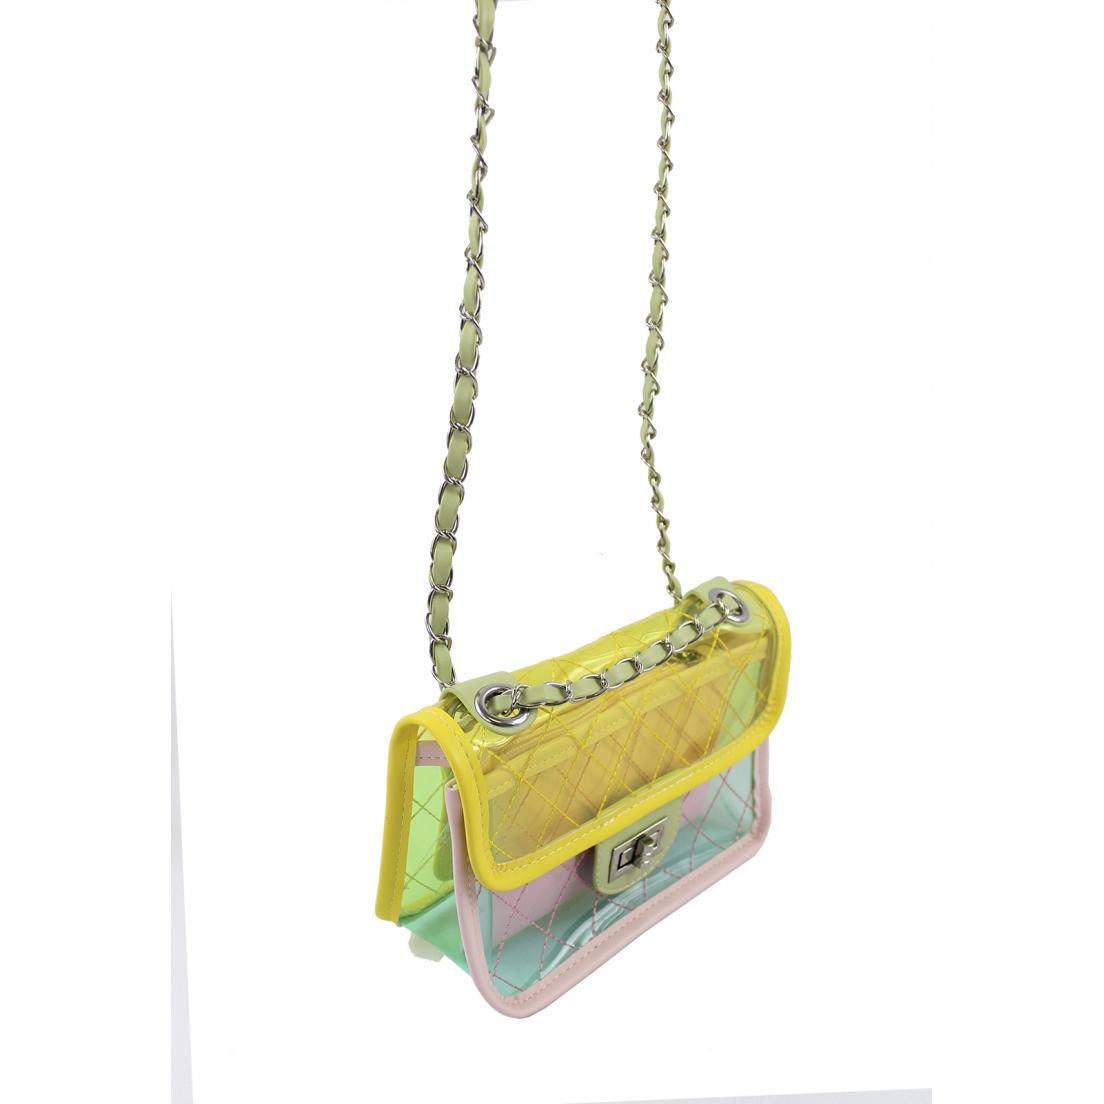 Bolsa Cristal com Matelassê